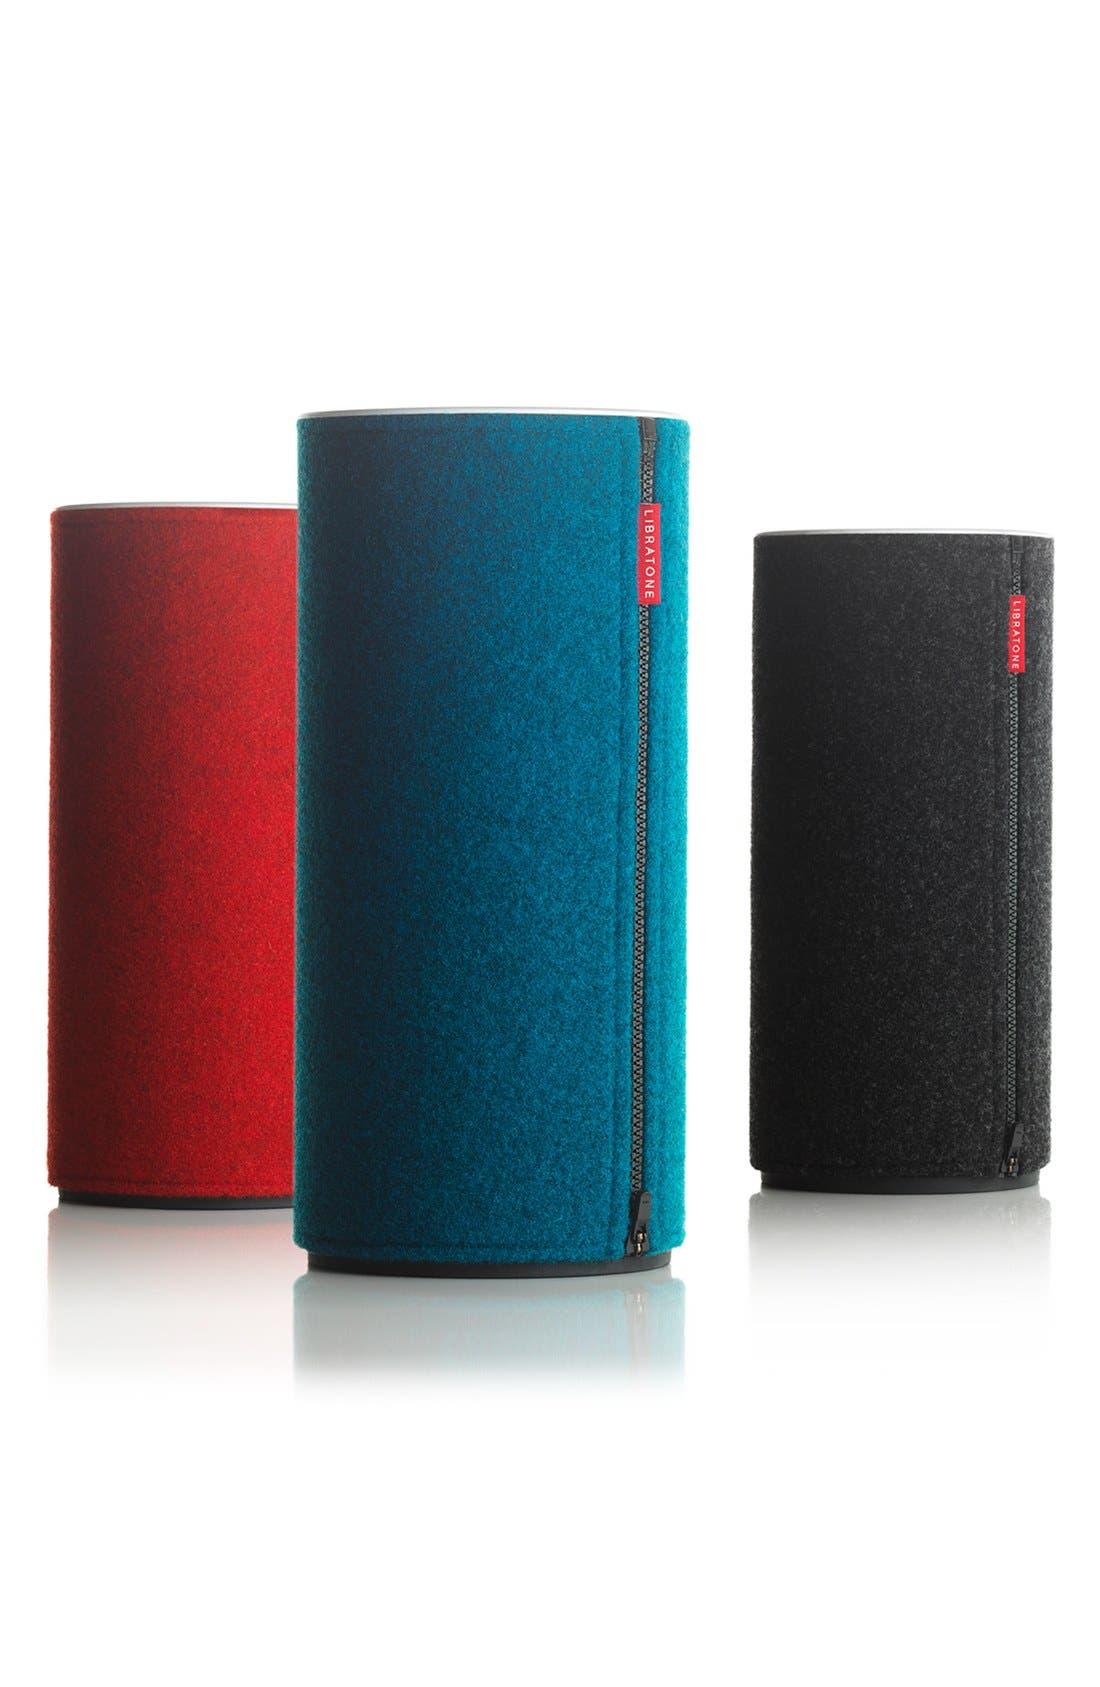 Main Image - Libratone™ 'ZIPP - Classic' Take Along Wireless Speaker with Interchangeable Covers